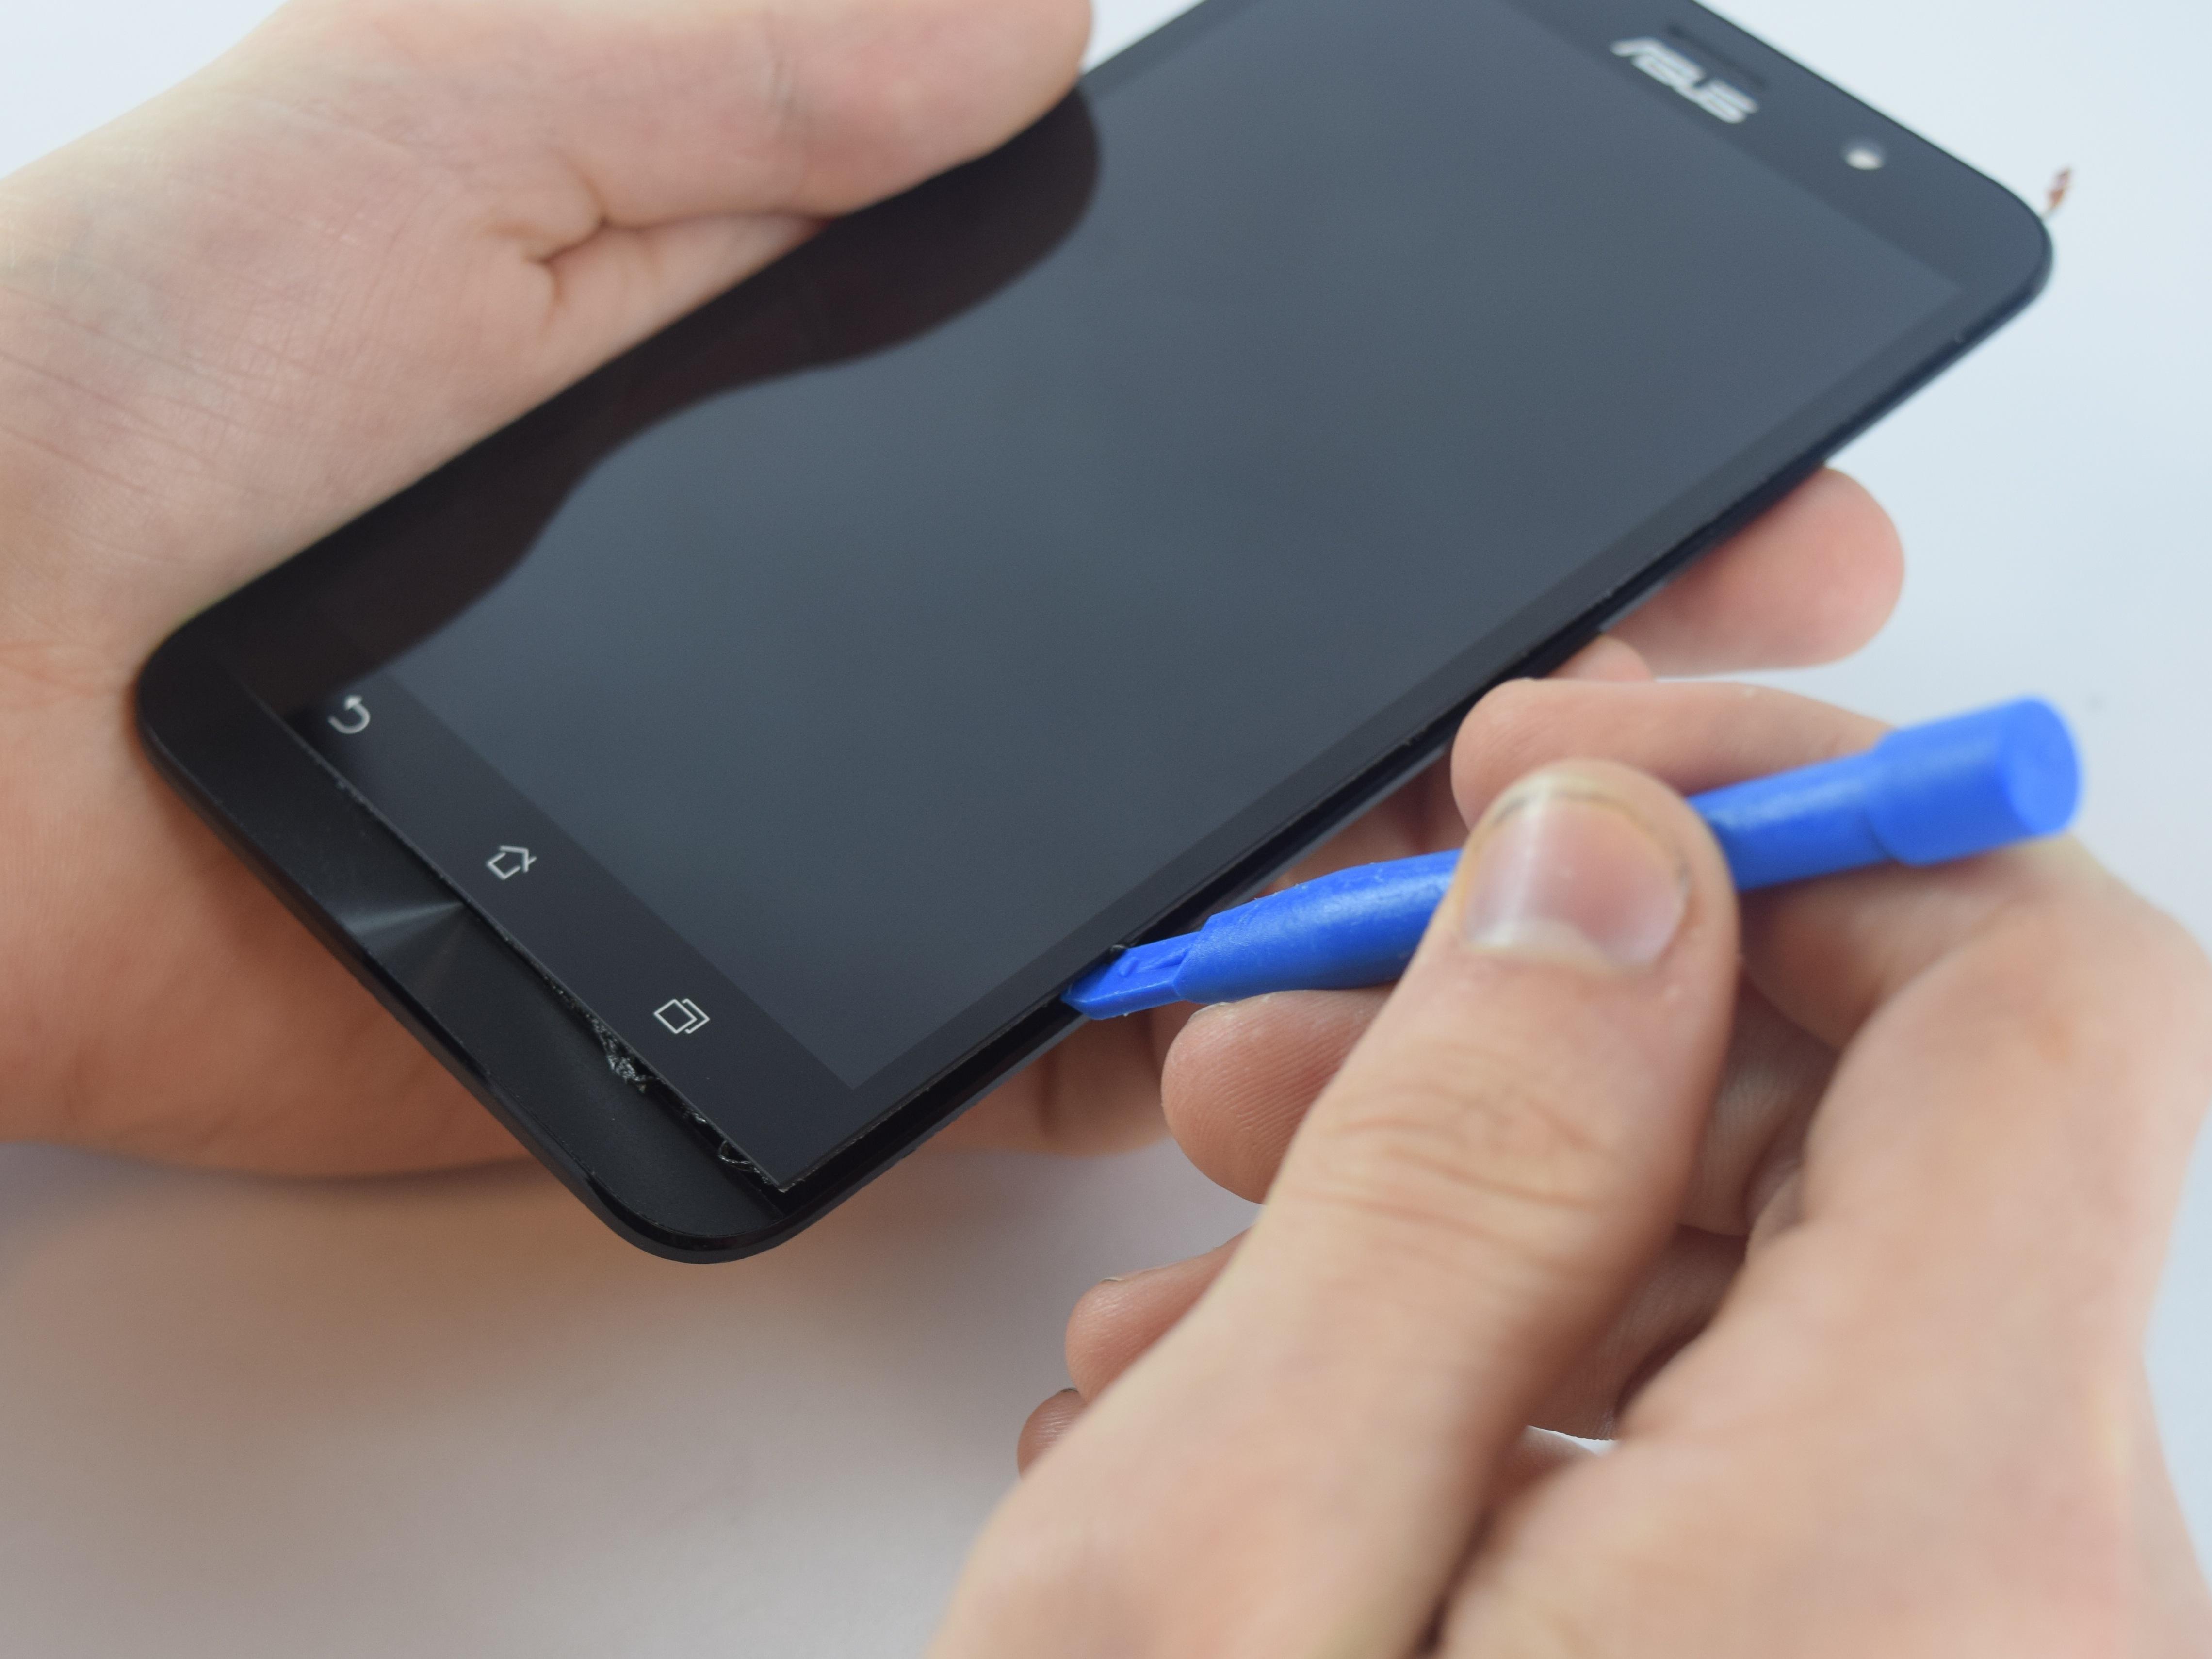 Asus ZenFone 2 Repair - iFixit